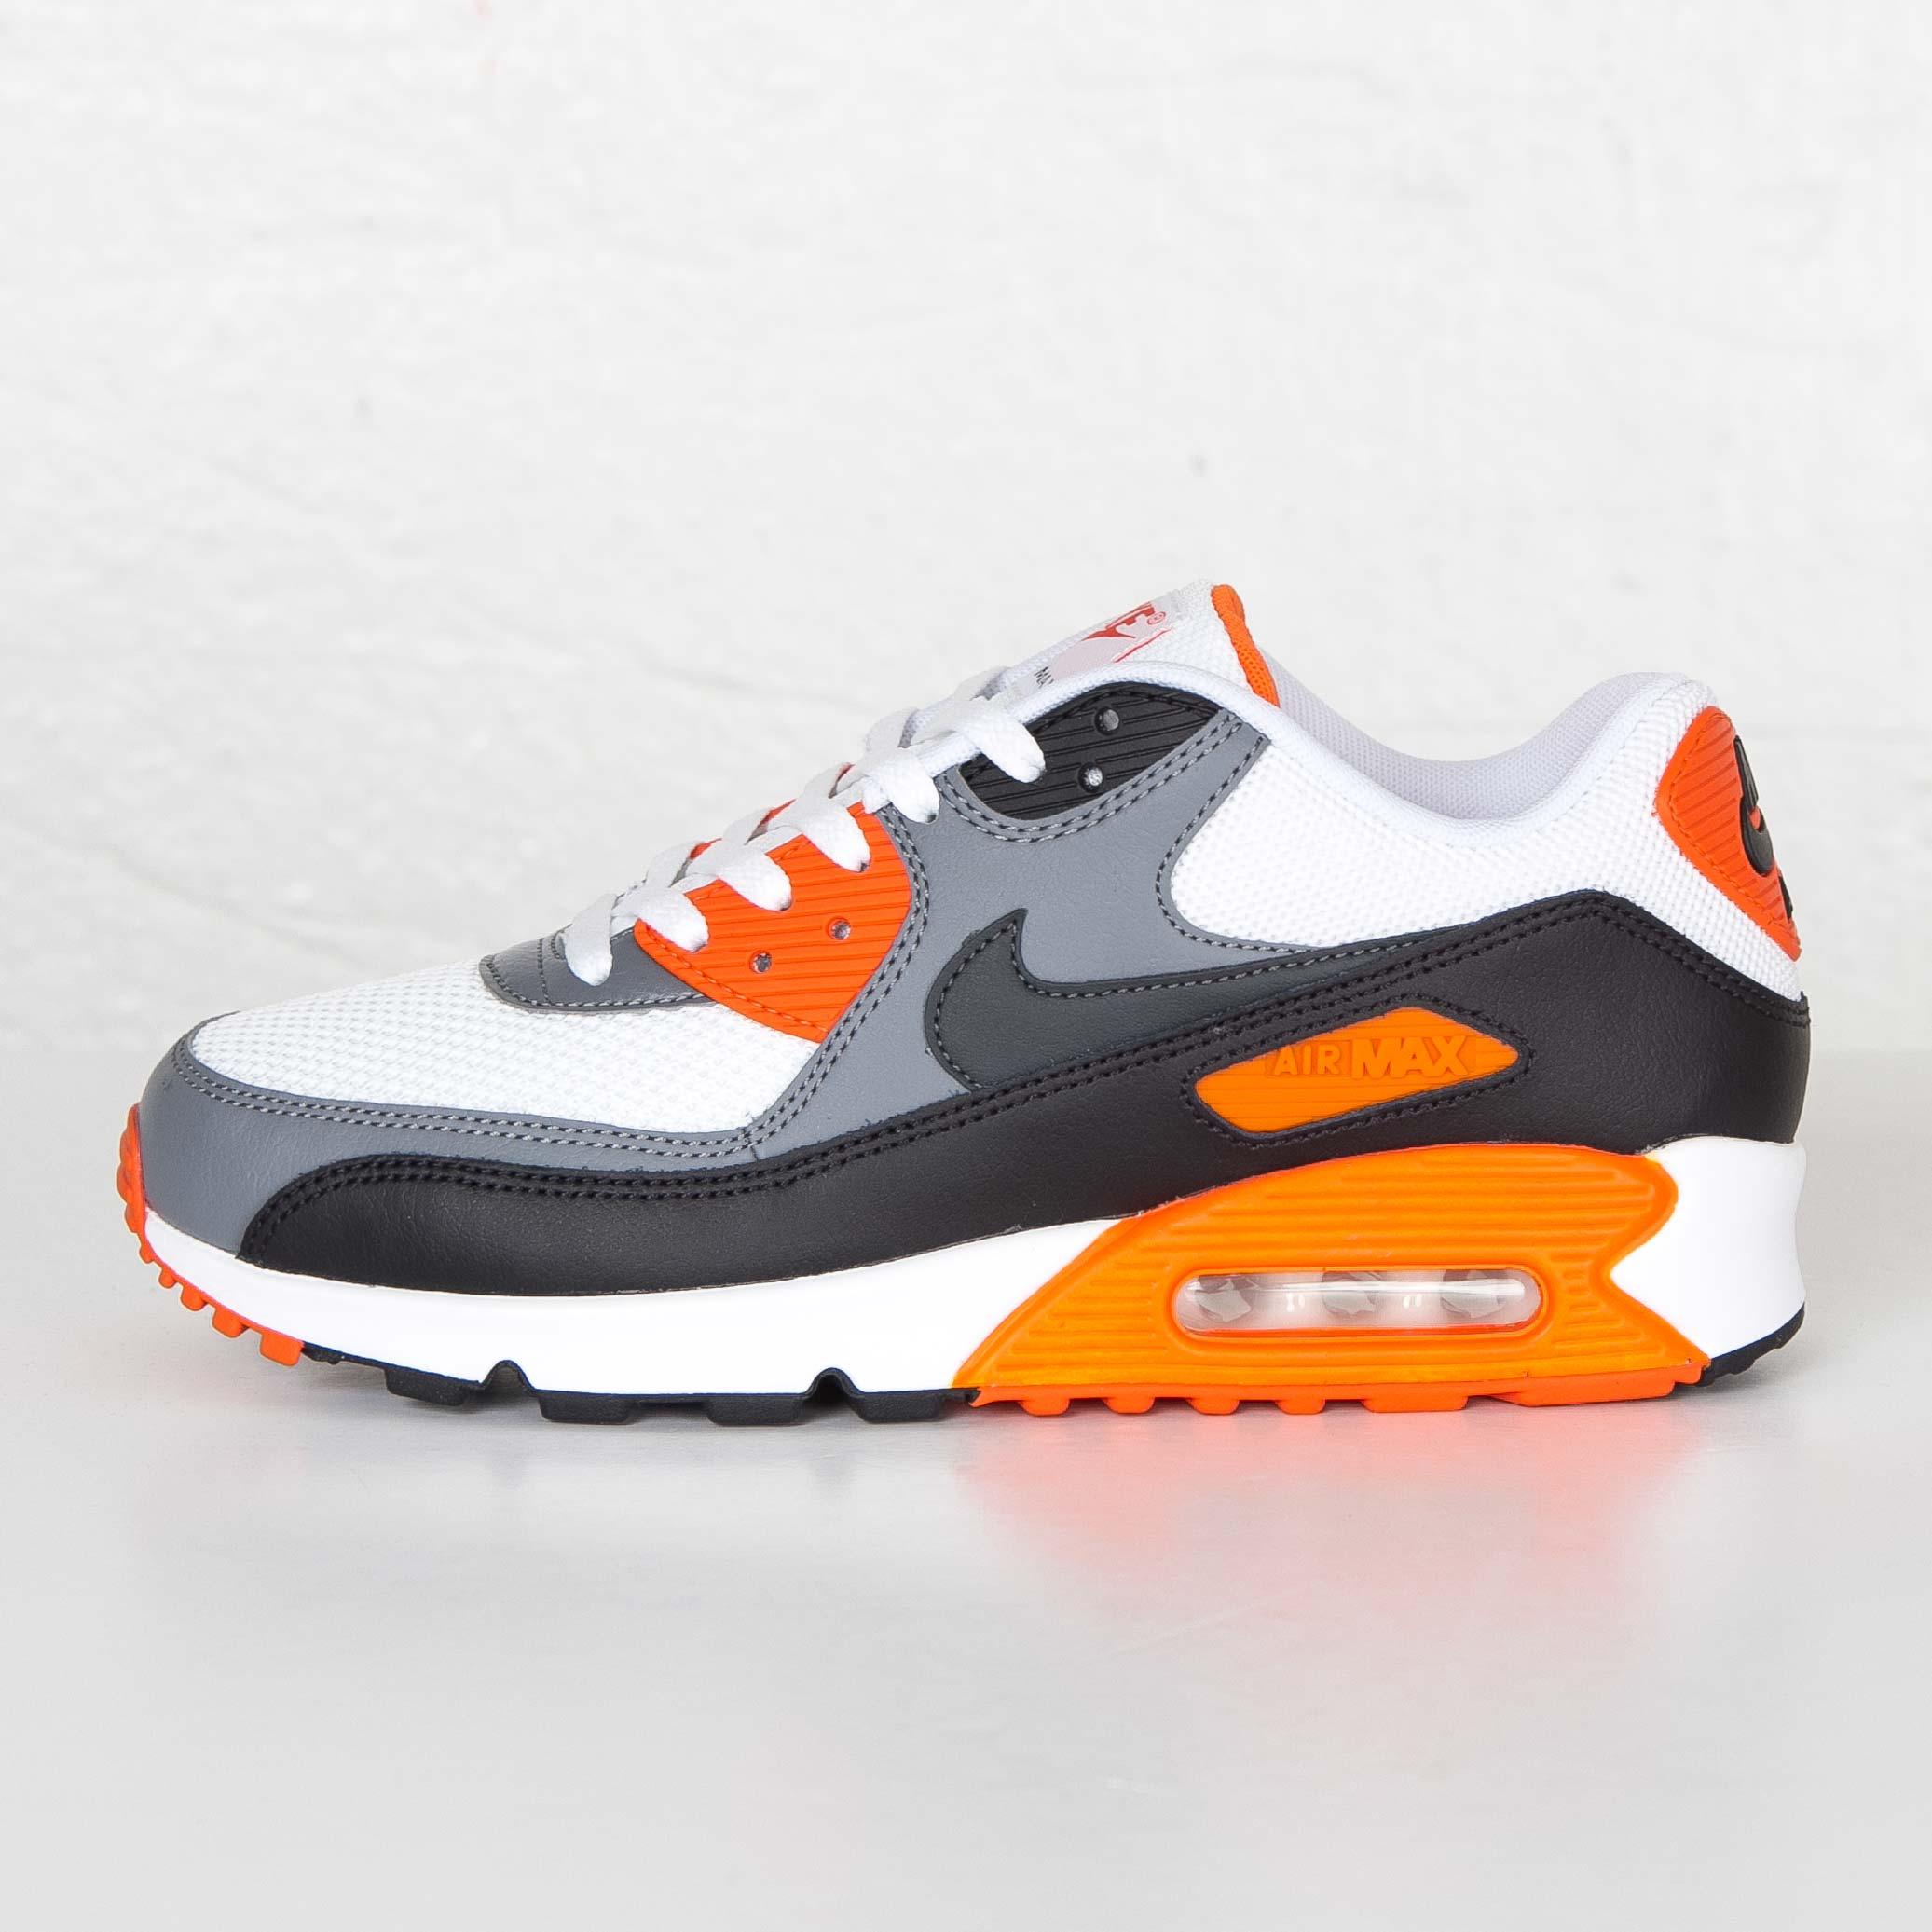 Nike Air Max 90 Essential 537384 128 Sneakersnstuff I